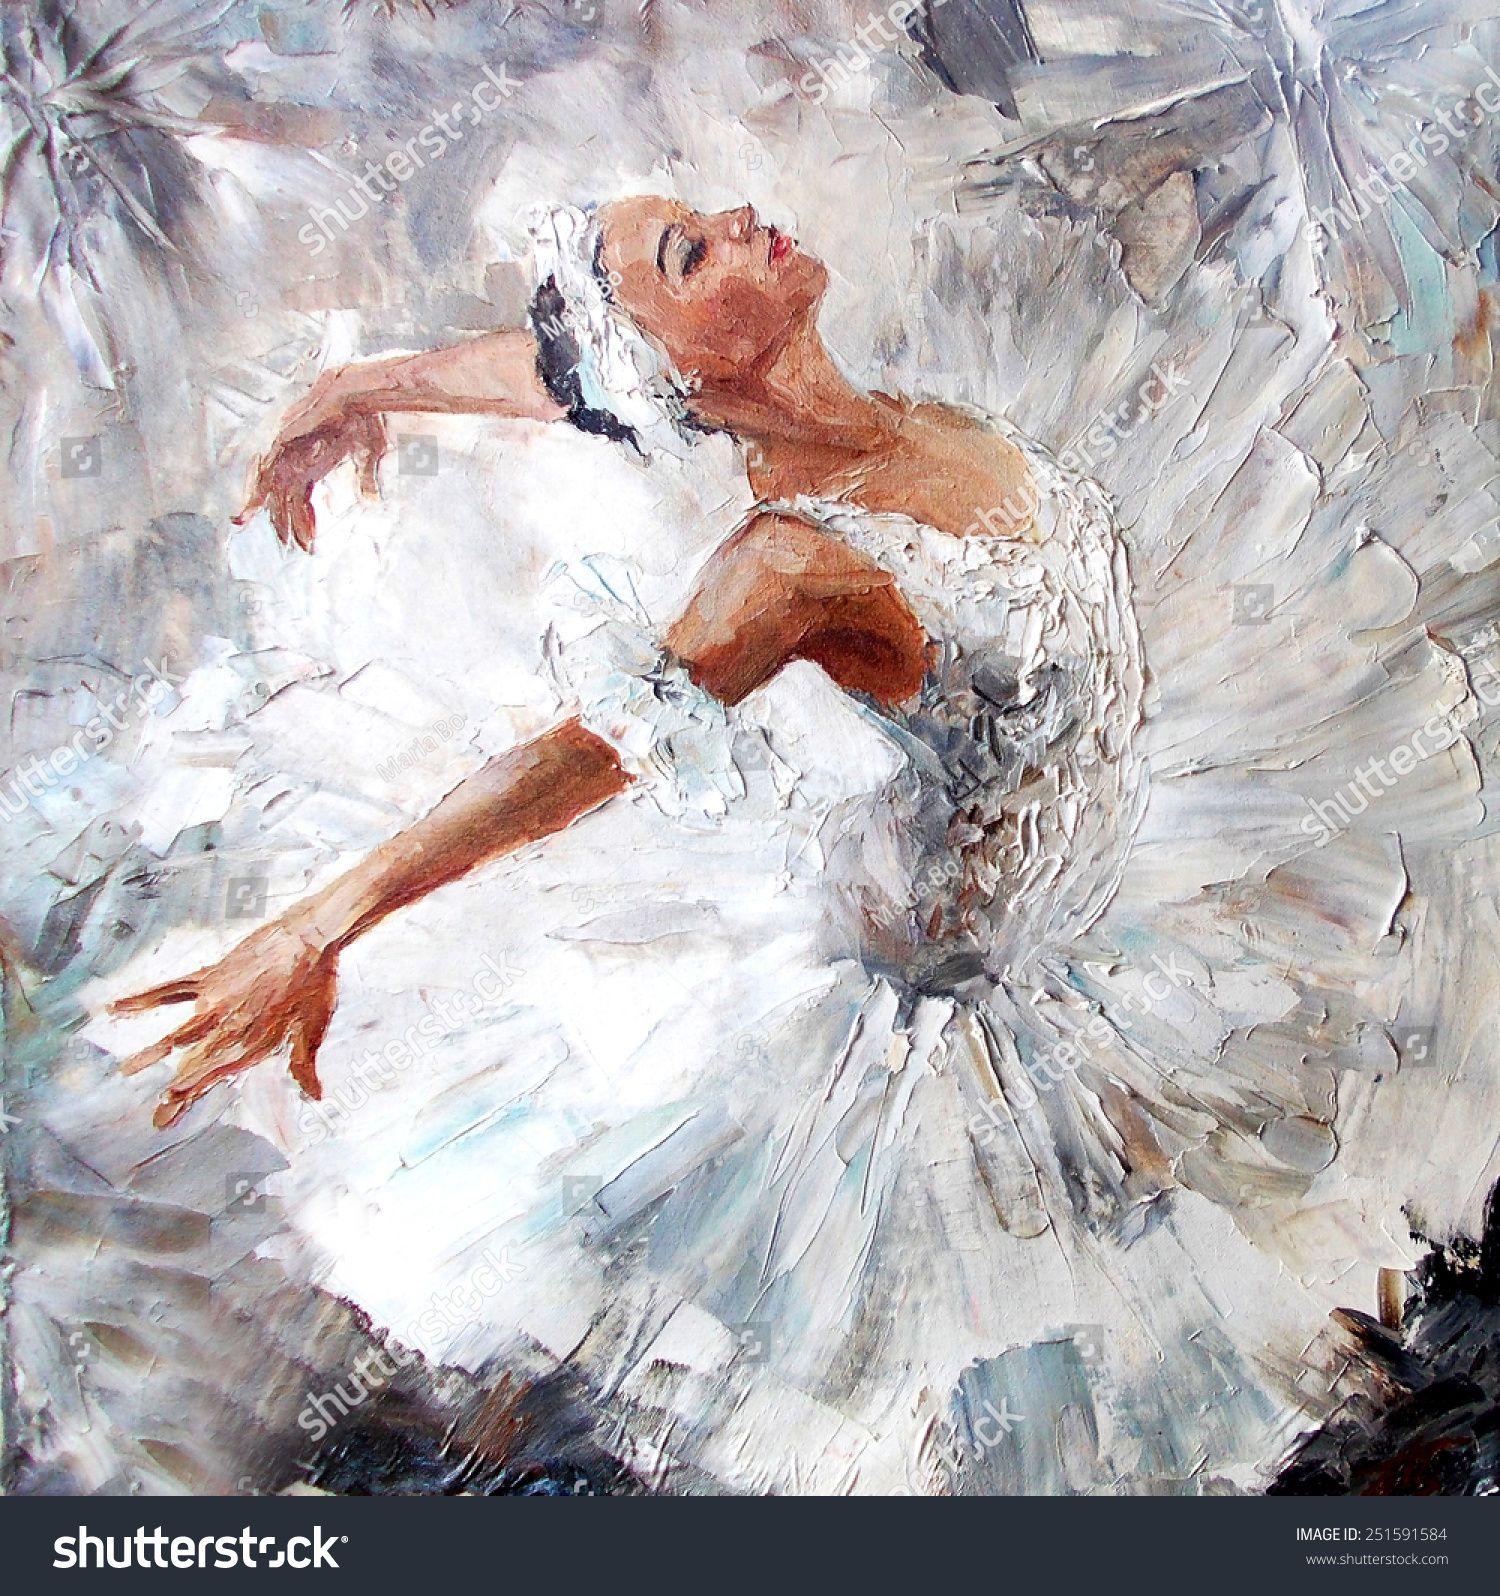 Margarita Vallejo Adli Kullanicinin Pintura Panosundaki Pin Bale Boyama Balerin Sanat Sanatsal Baski